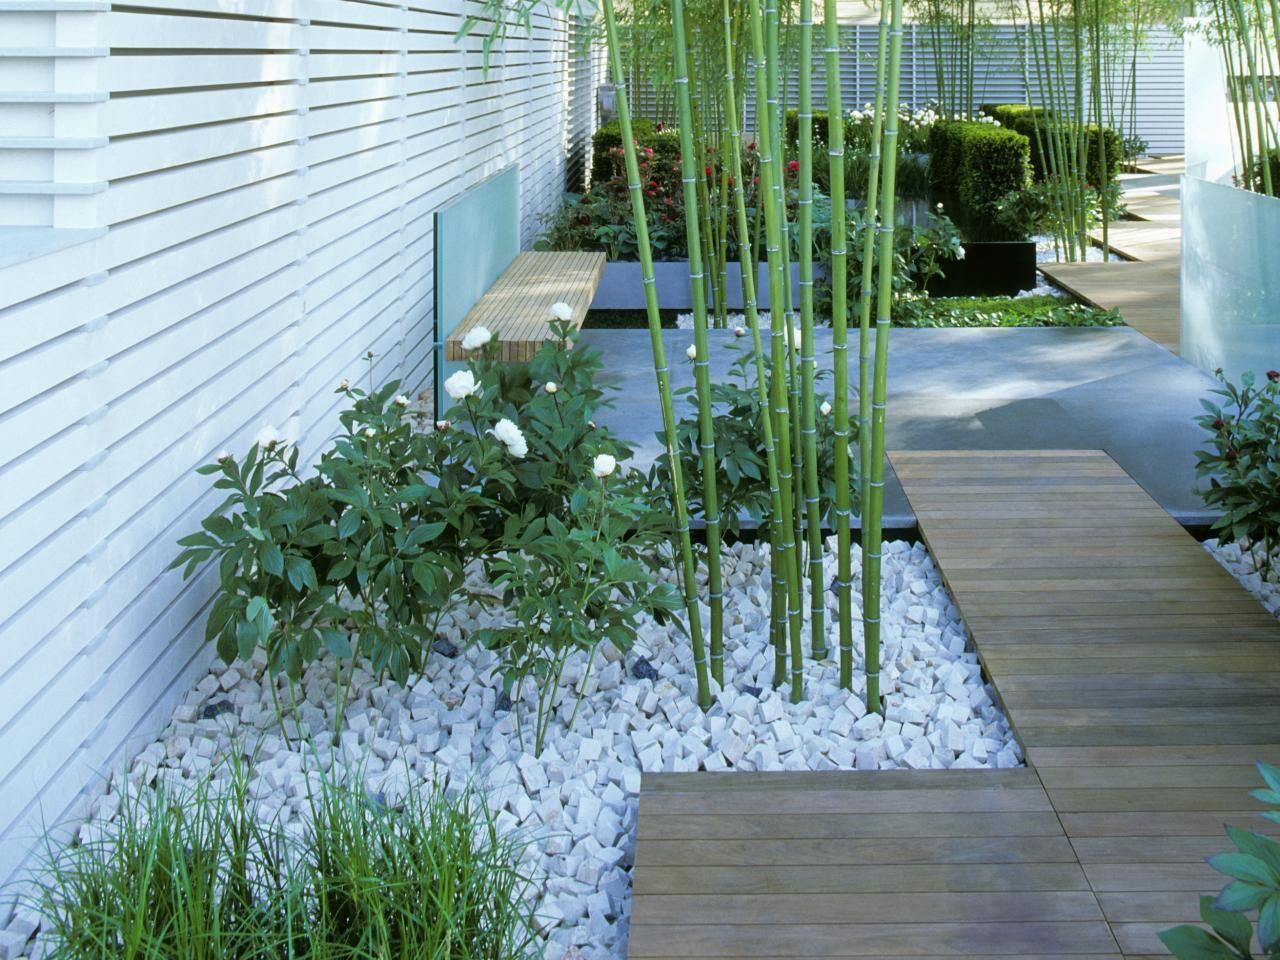 Imagenes De Jardines Minimalistas Usando Piedras Jardines Modernos Jardin Minimalista Jardines